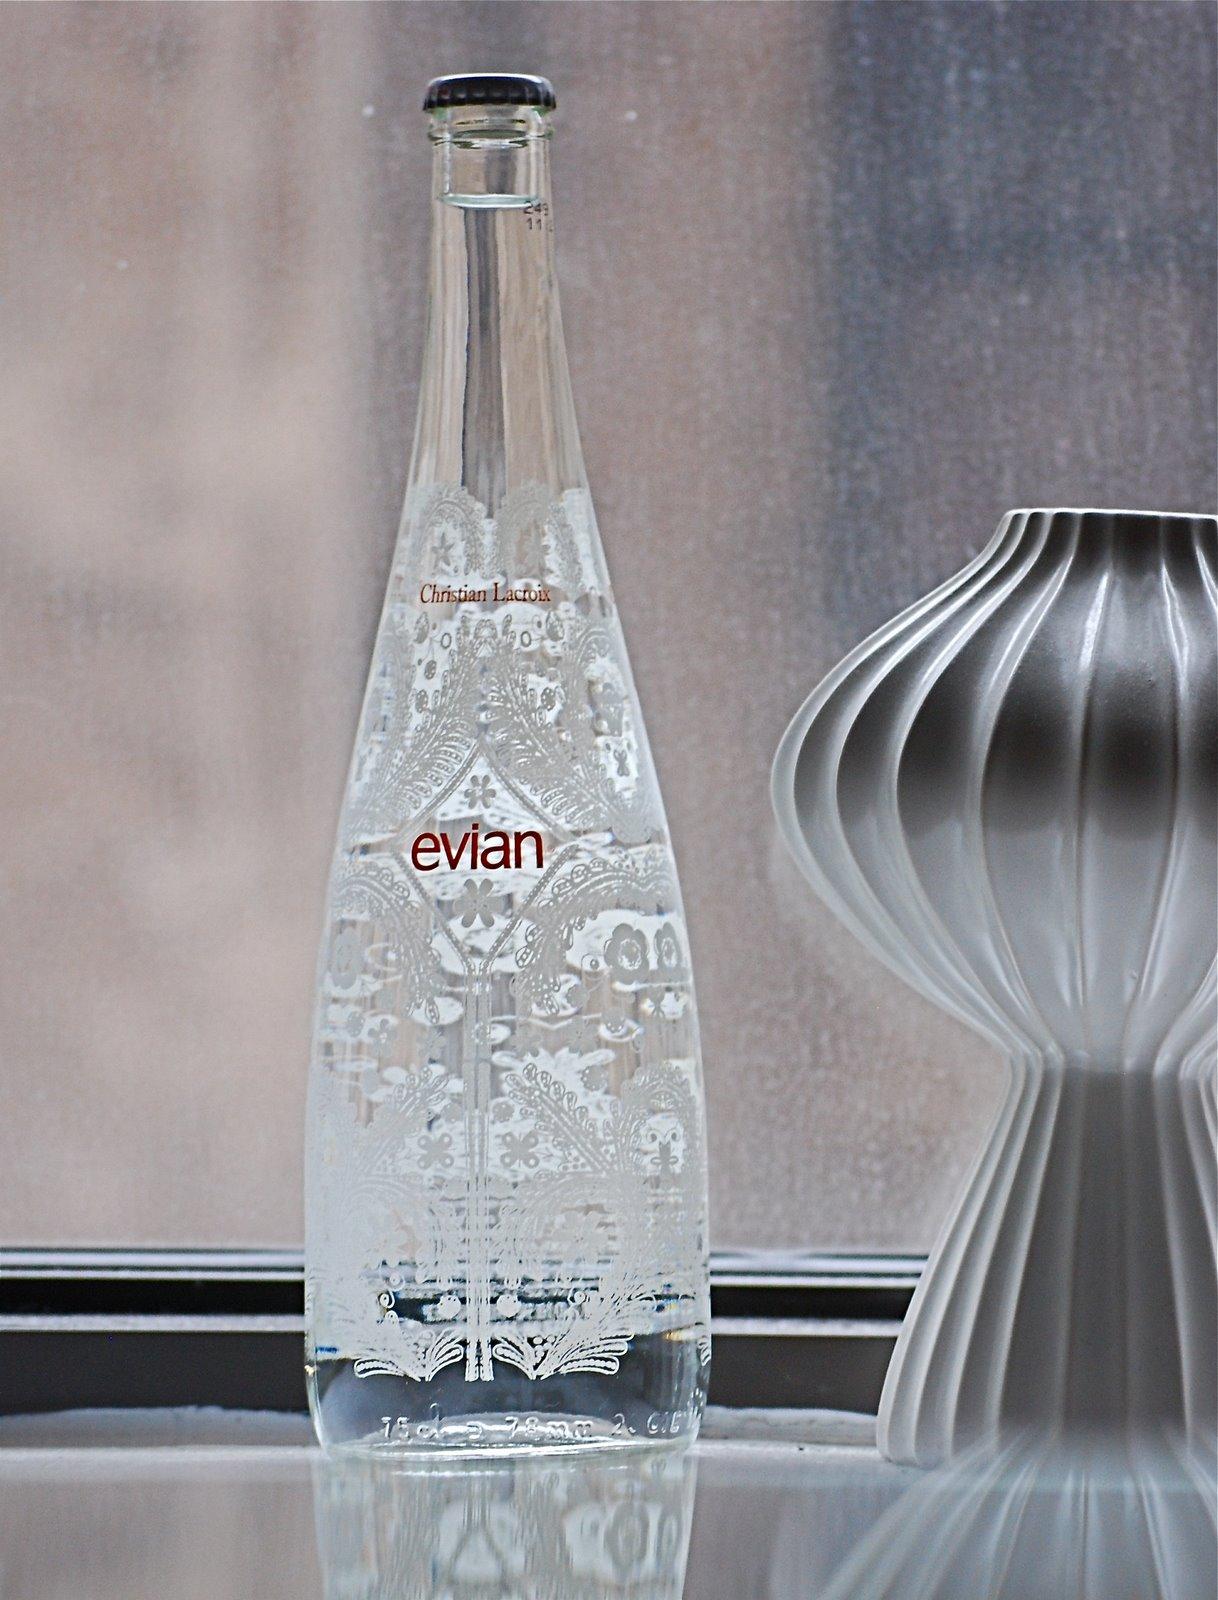 Bonafidebride pretty evian water by christian lacroix - Evian christian lacroix ...